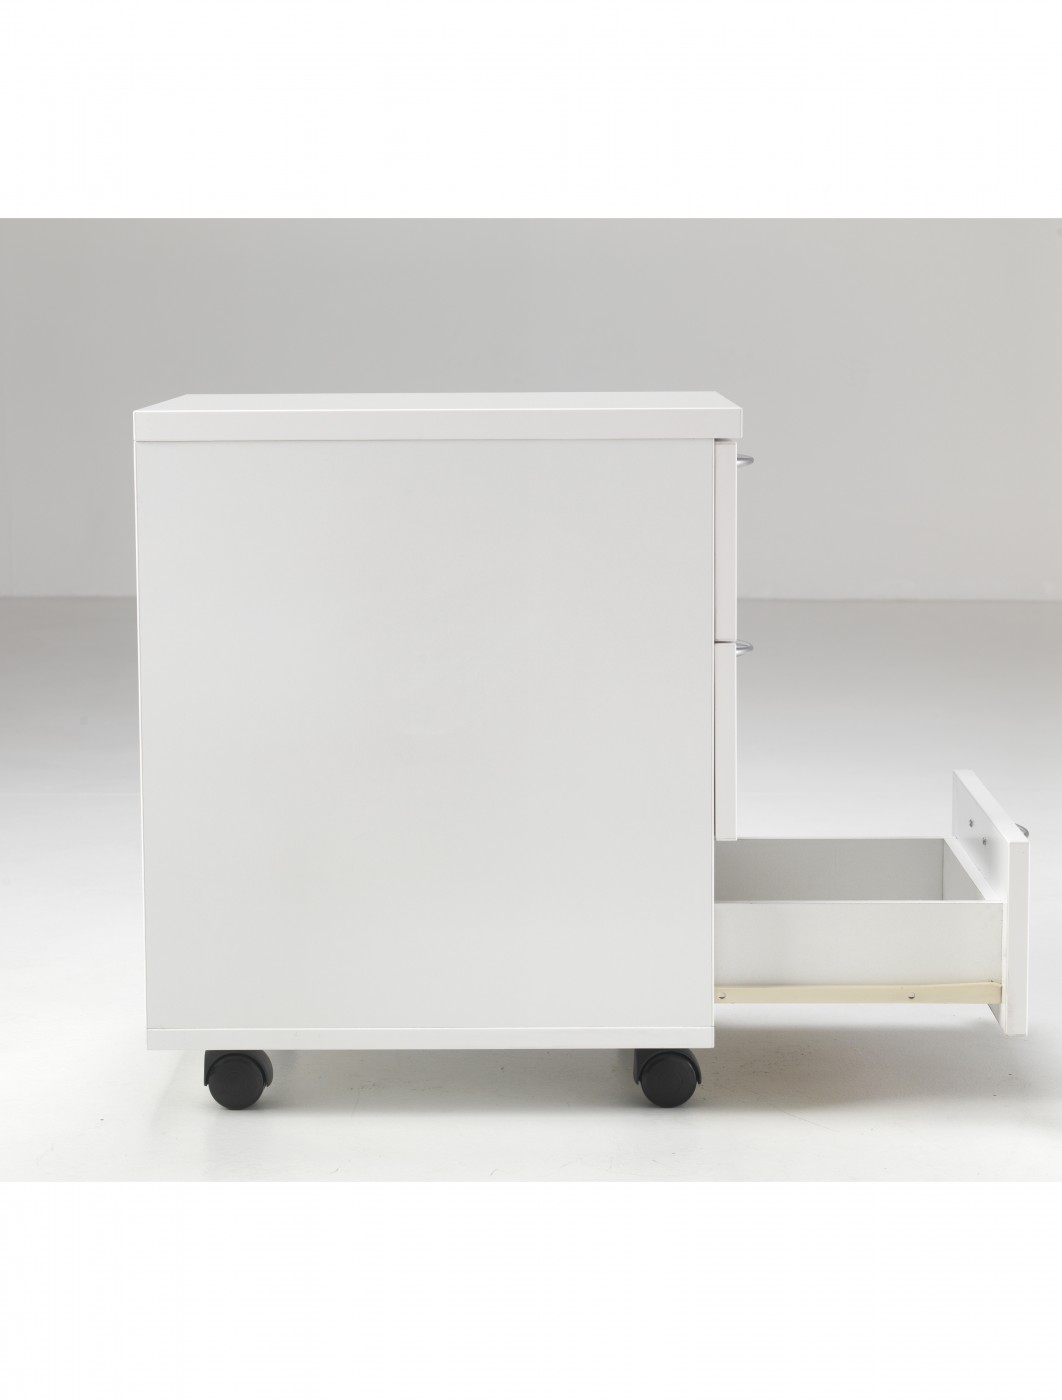 office chair pedestal ergonomic high back tc lite 1600mm desk and baresi bundle